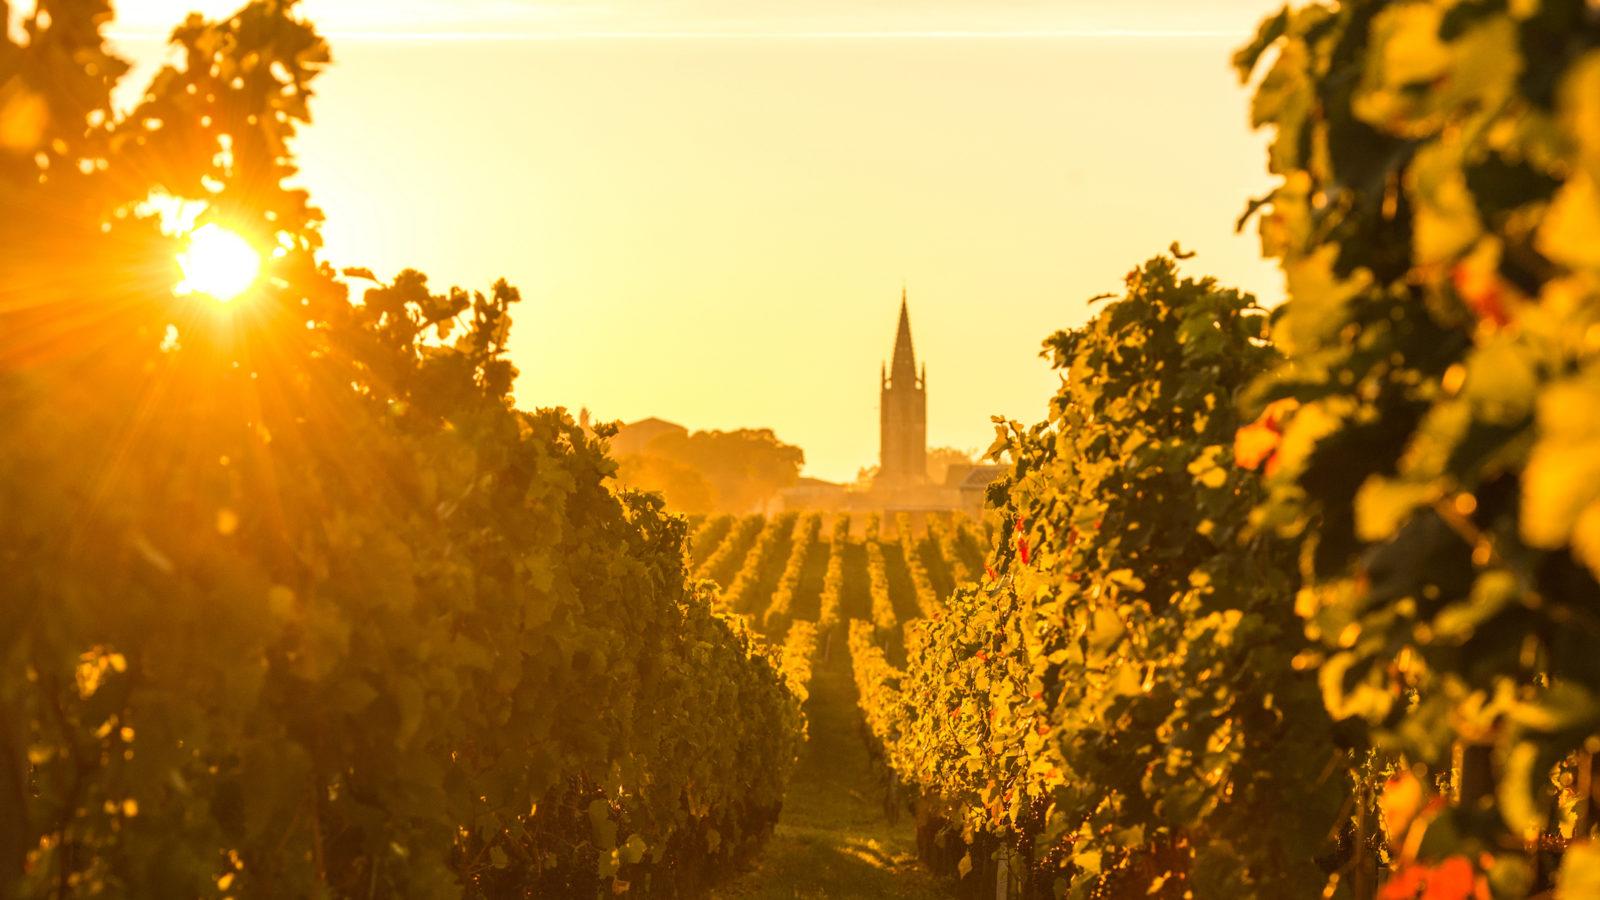 Best of Wine: The Top 10 Bordeaux Bottles of 2020